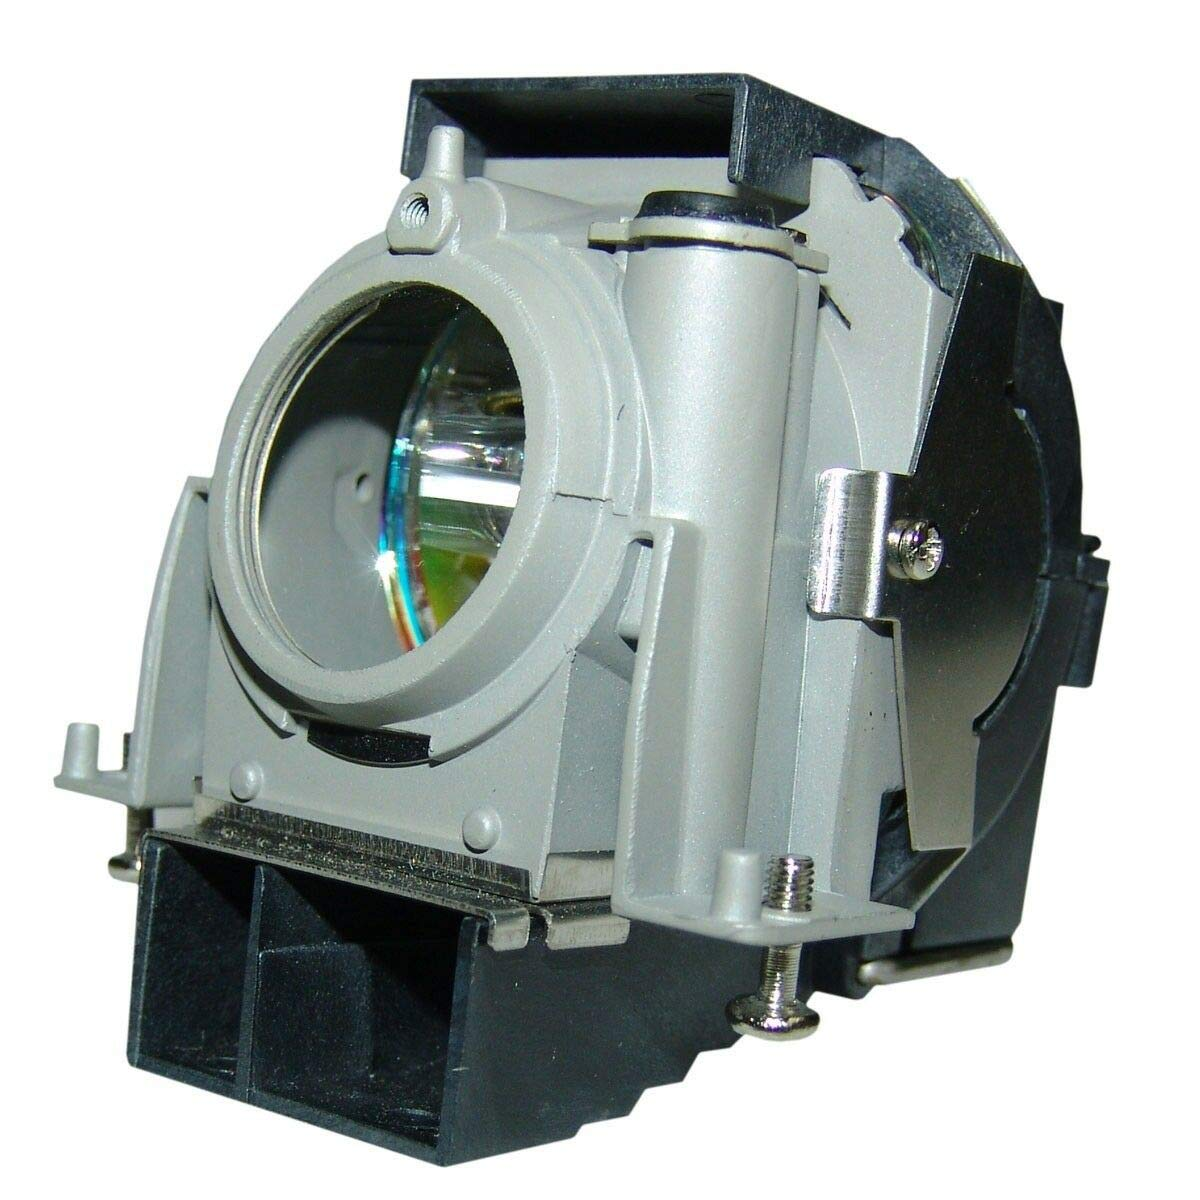 CTLAMP NP02LP オリジナルランプ電球 ハウジング付き NEC NP40 / NP50 / NP40G / NP50G / NP40+ / NP50+に対応   B07P9Z82GR